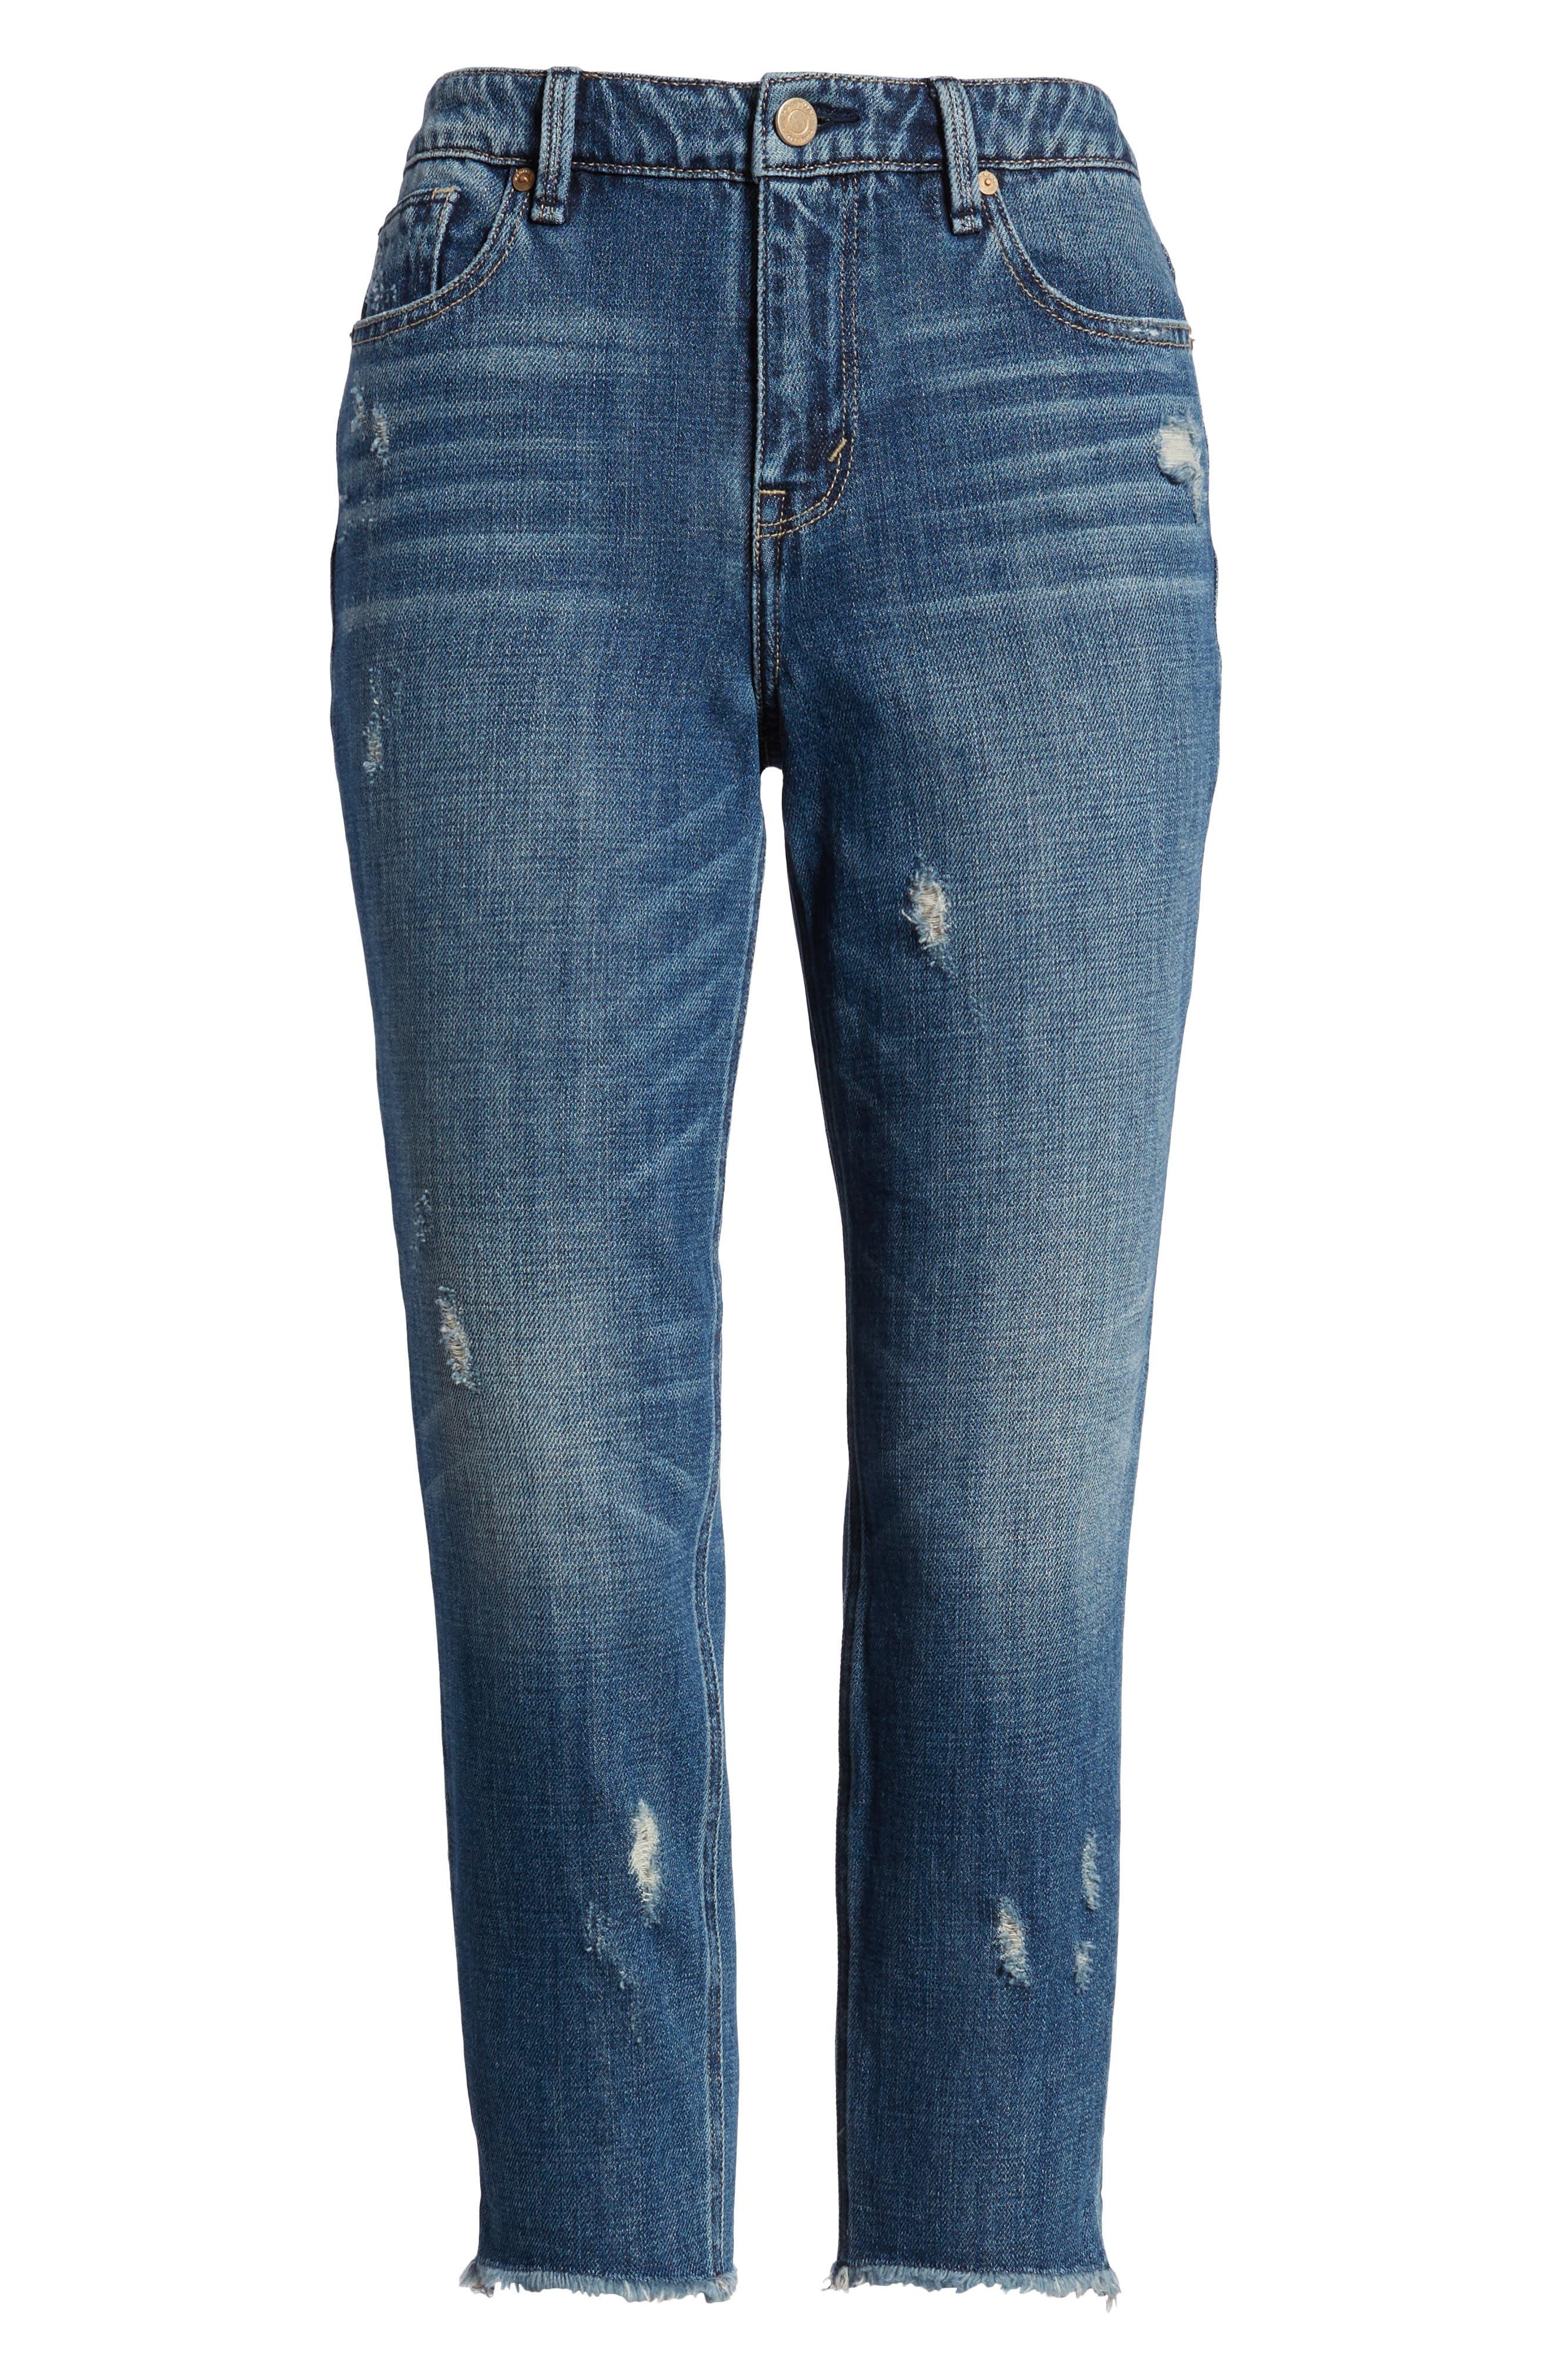 Vale Slant Fray Hem Jeans,                             Alternate thumbnail 7, color,                             401